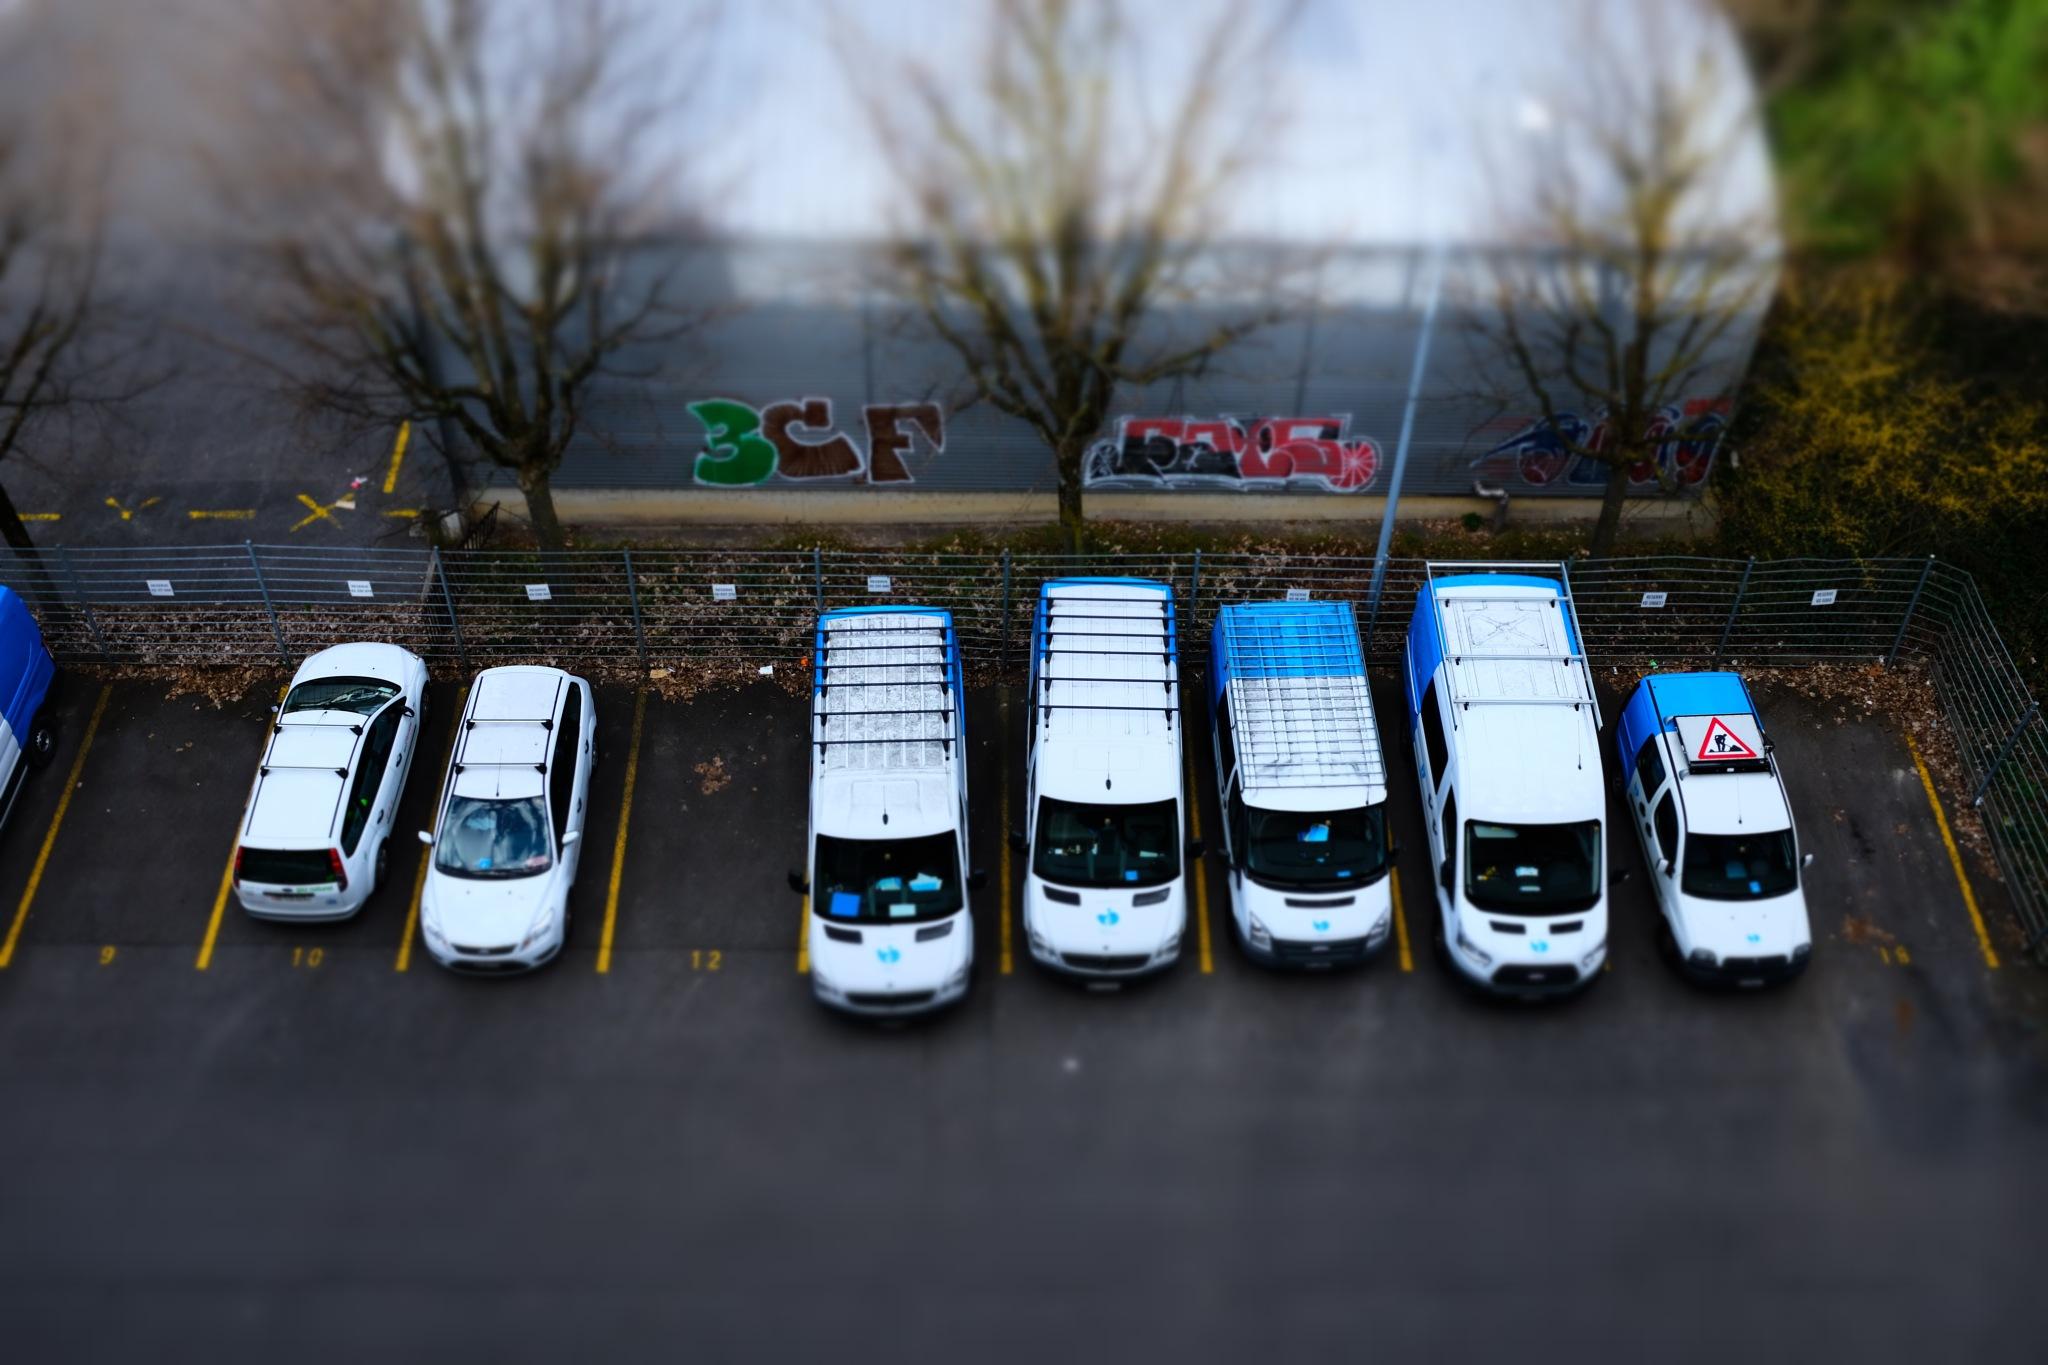 Mini Vans by Cris Estalayo